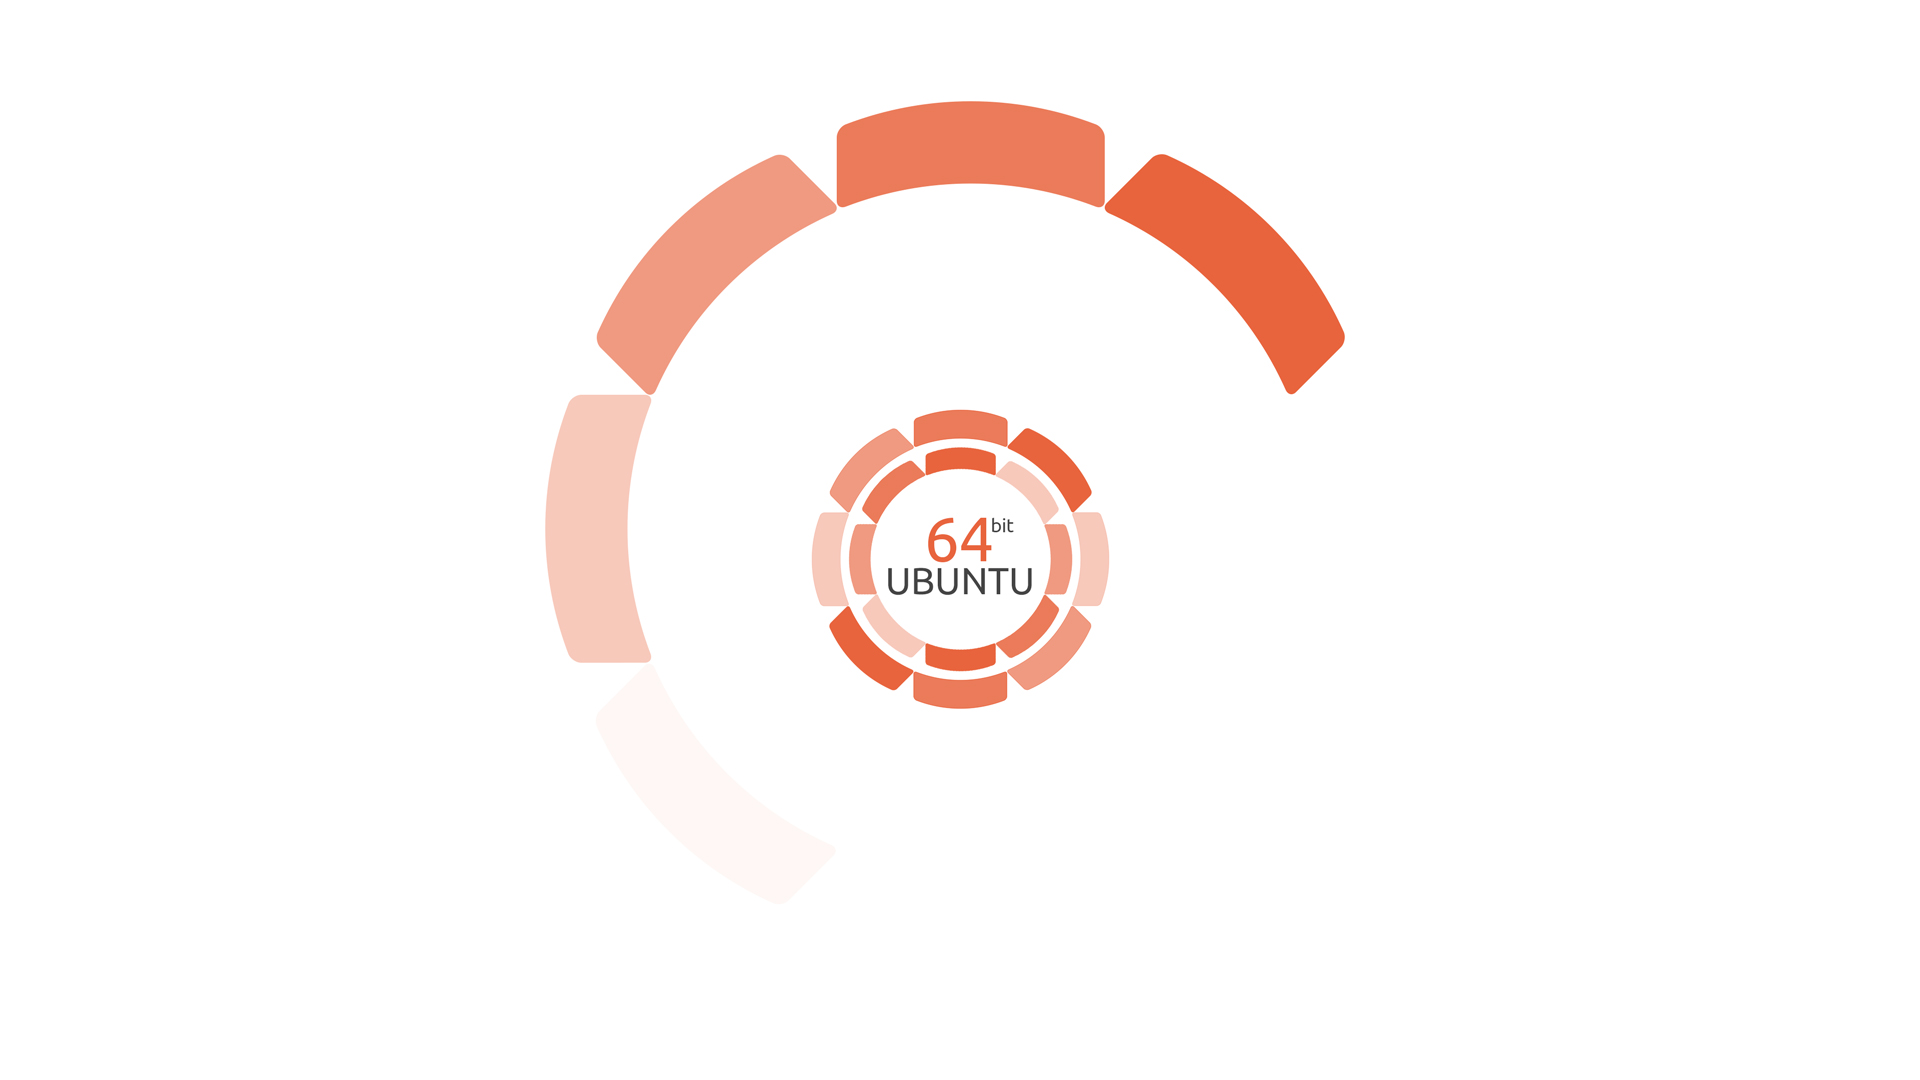 Ubuntu-64bitregal